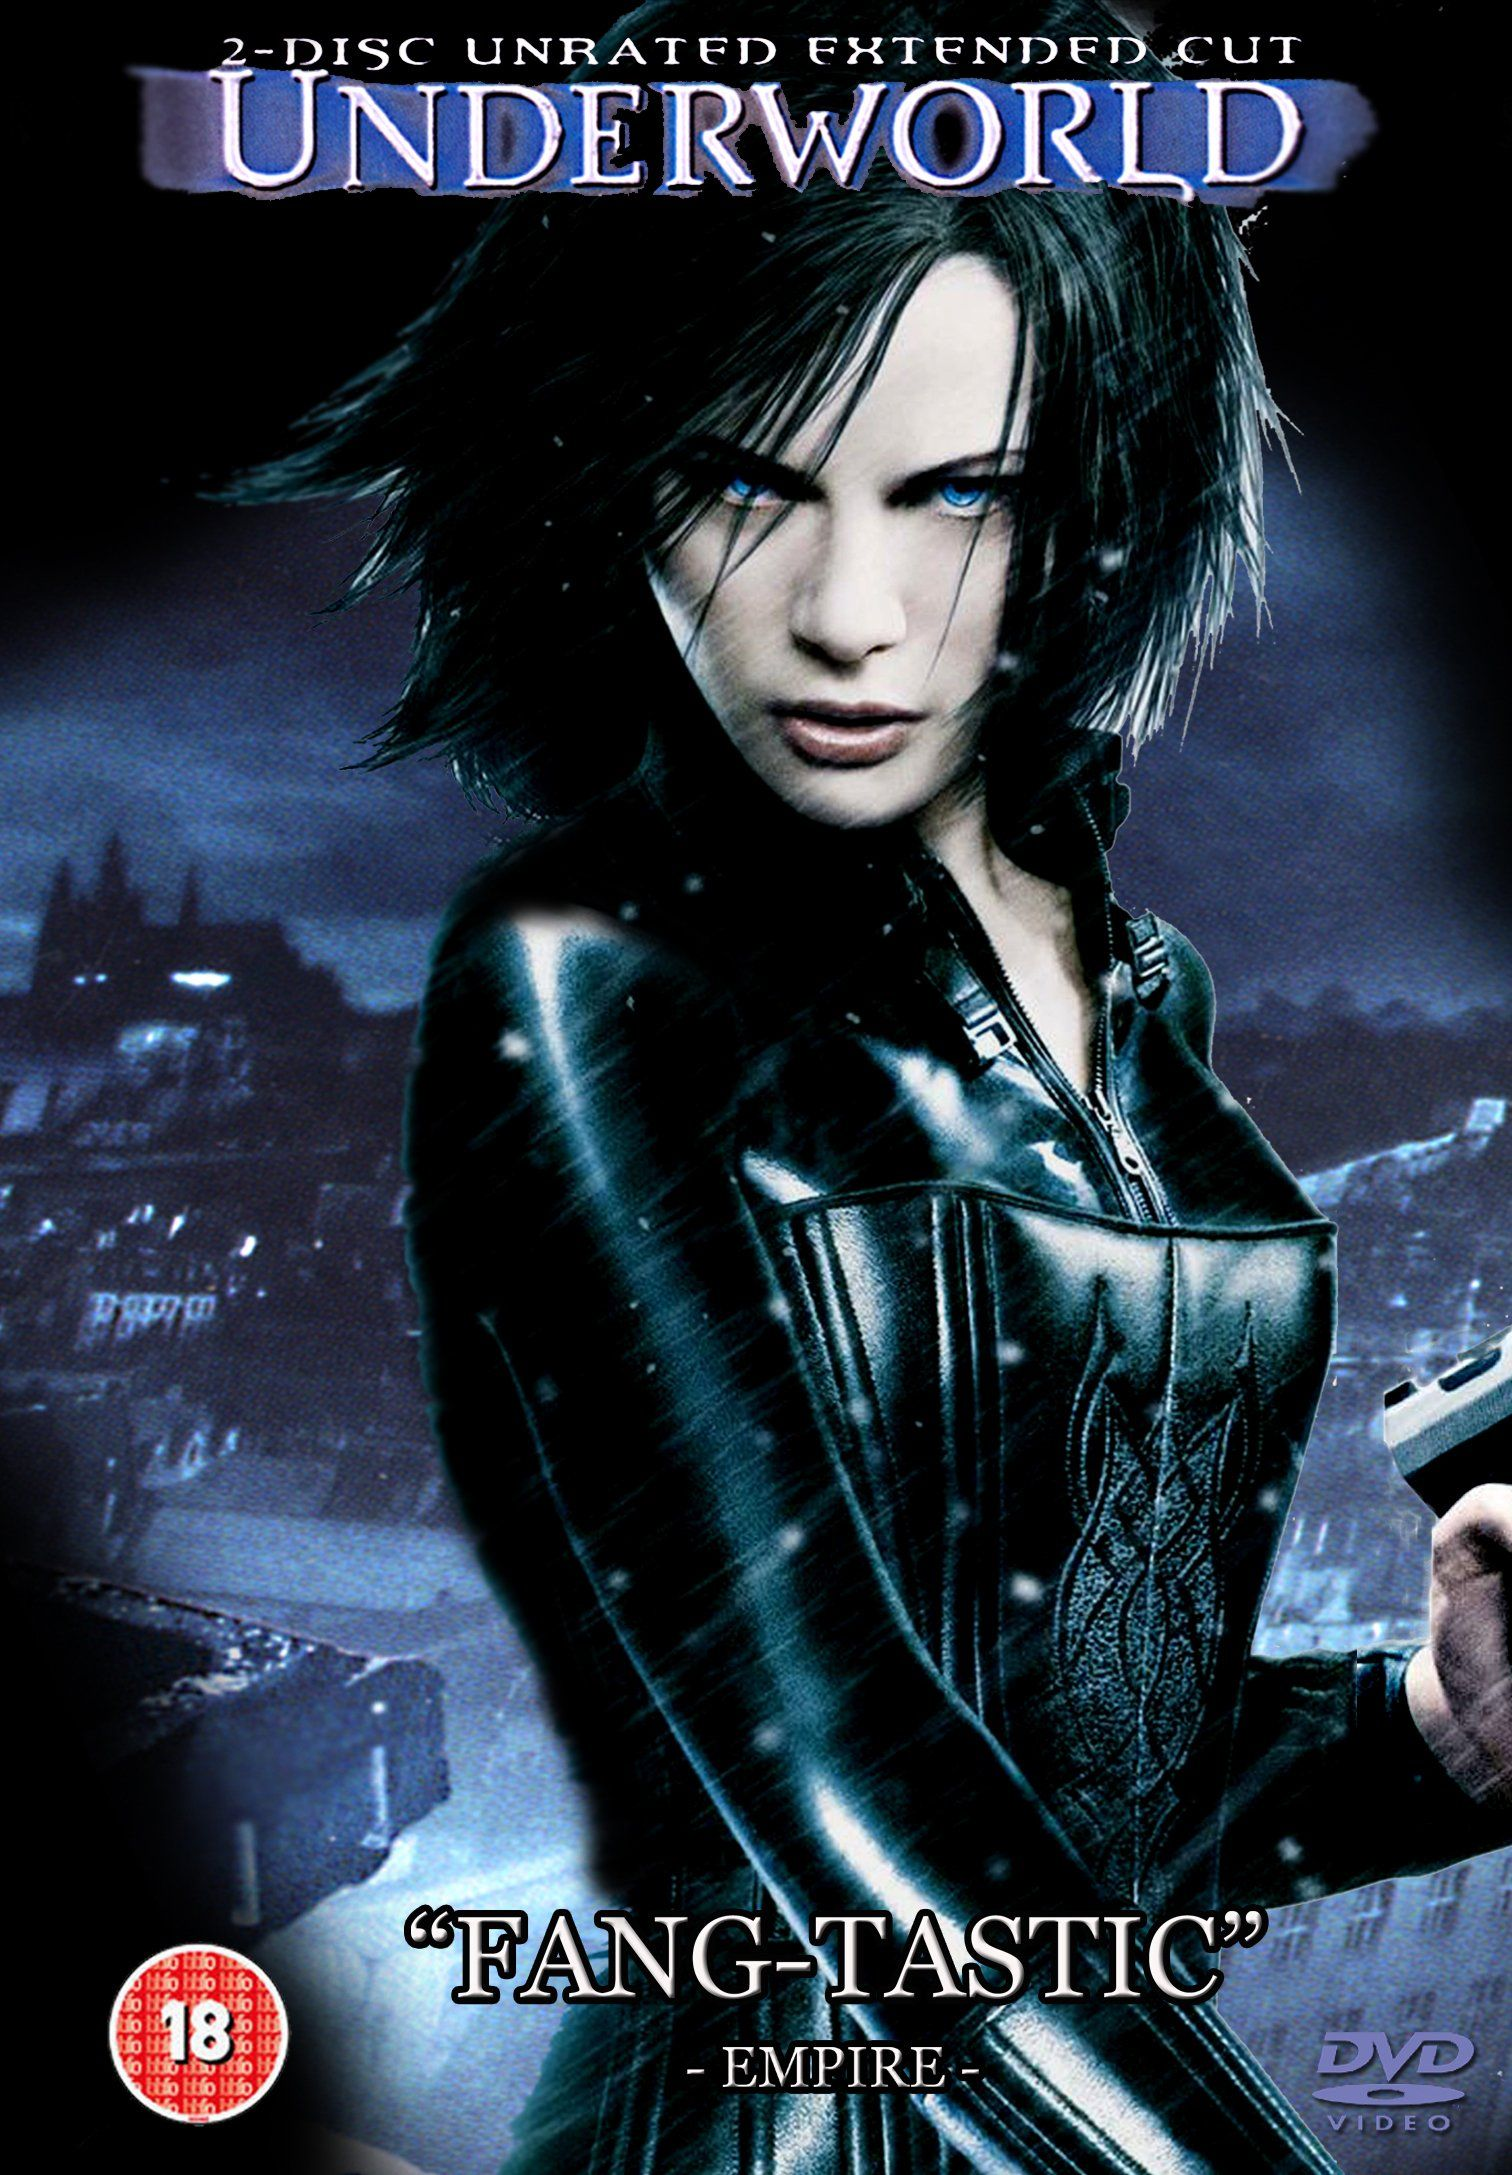 Image detail for -Underworld (2003) poster - FreeMoviePosters.net ...